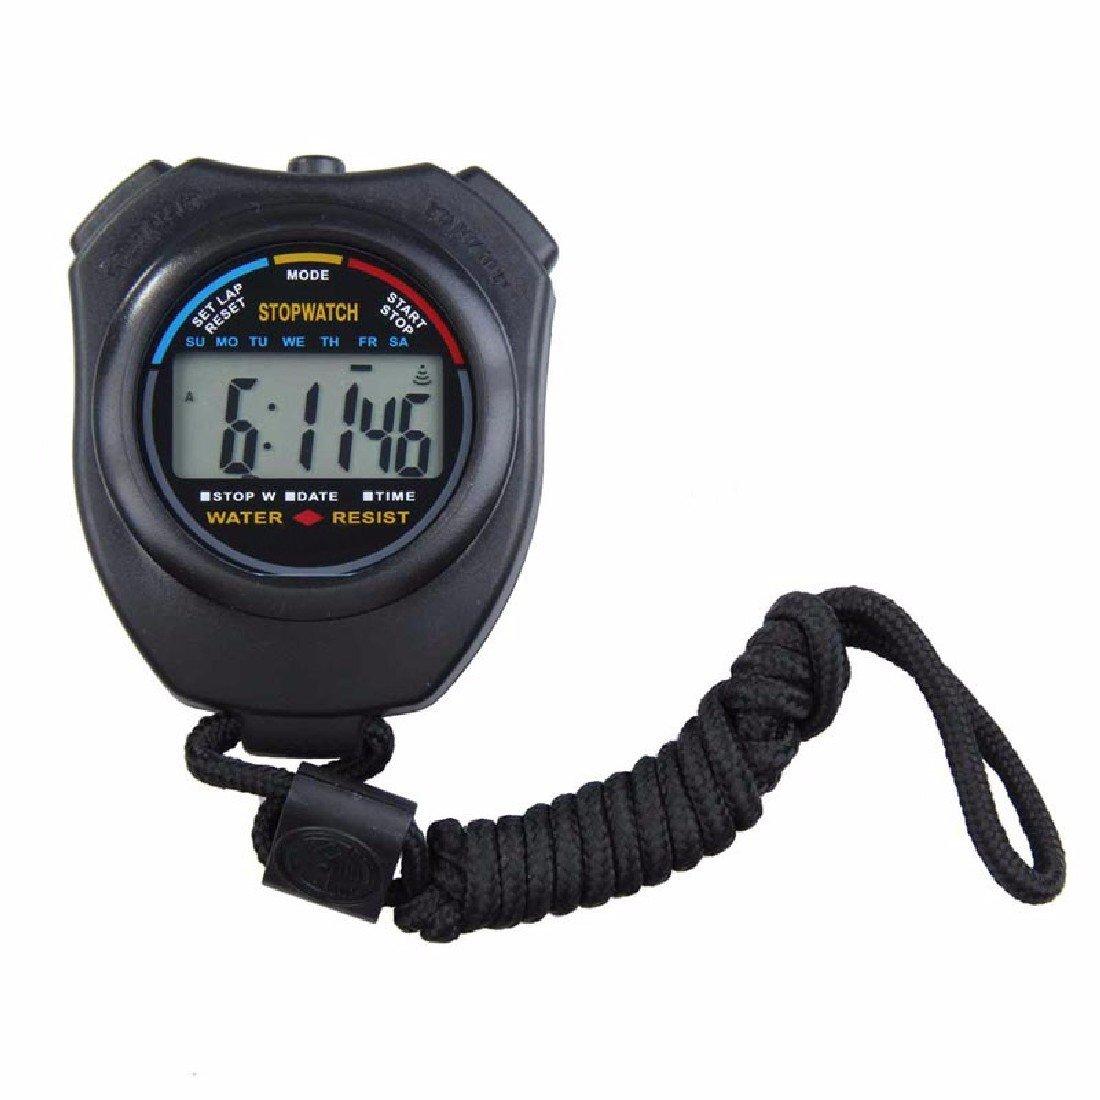 Deportes cronómetro profesional digital portátil LCD Deporte Cronómetro contador del temporizador